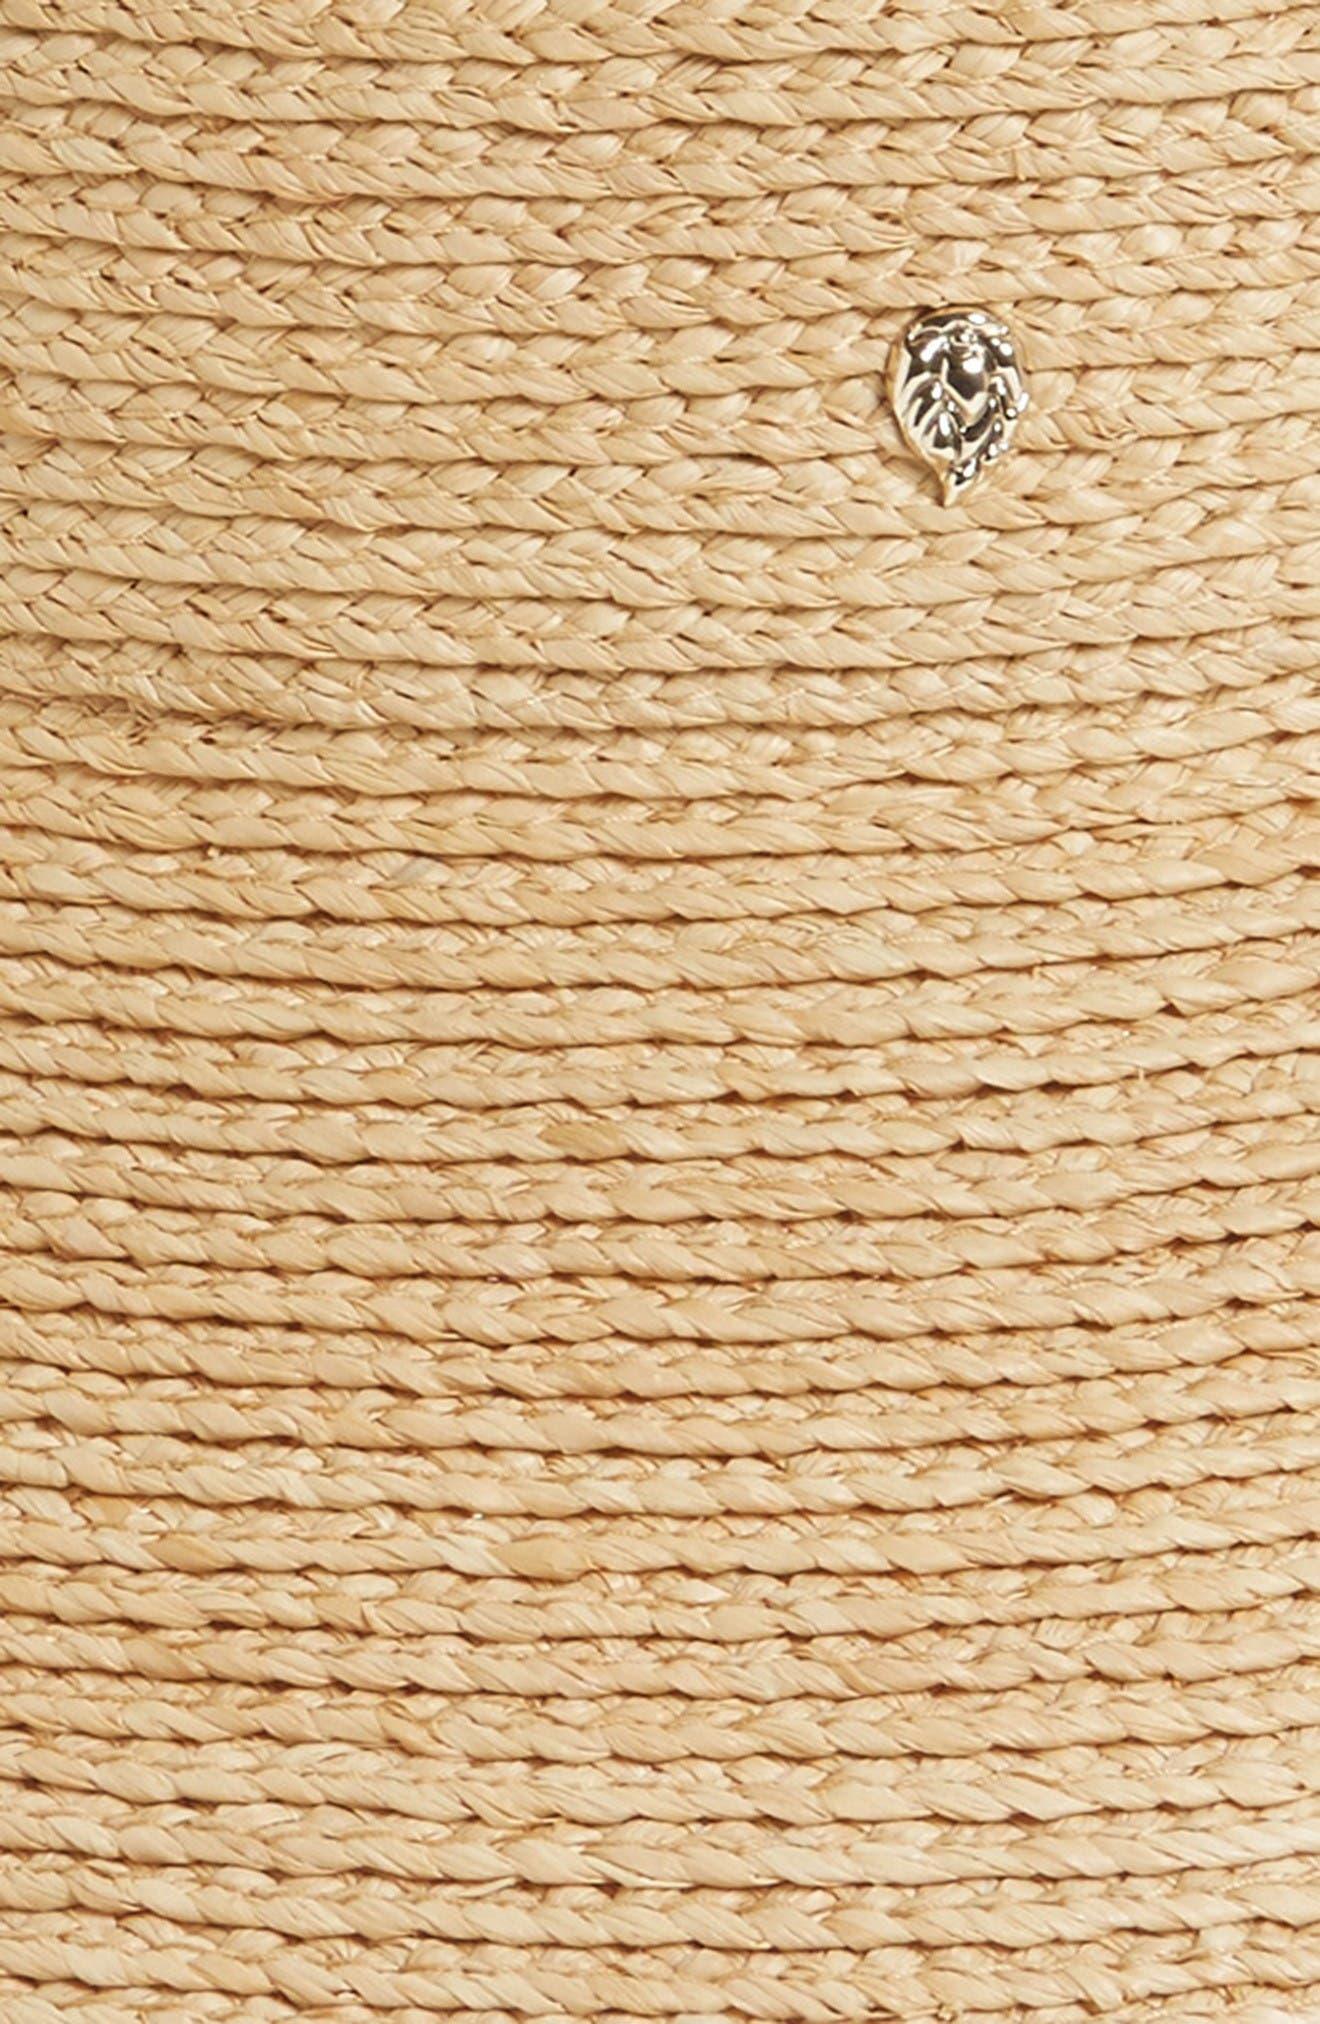 'Mita' Packable Raffia Visor,                             Alternate thumbnail 2, color,                             Natural Sand